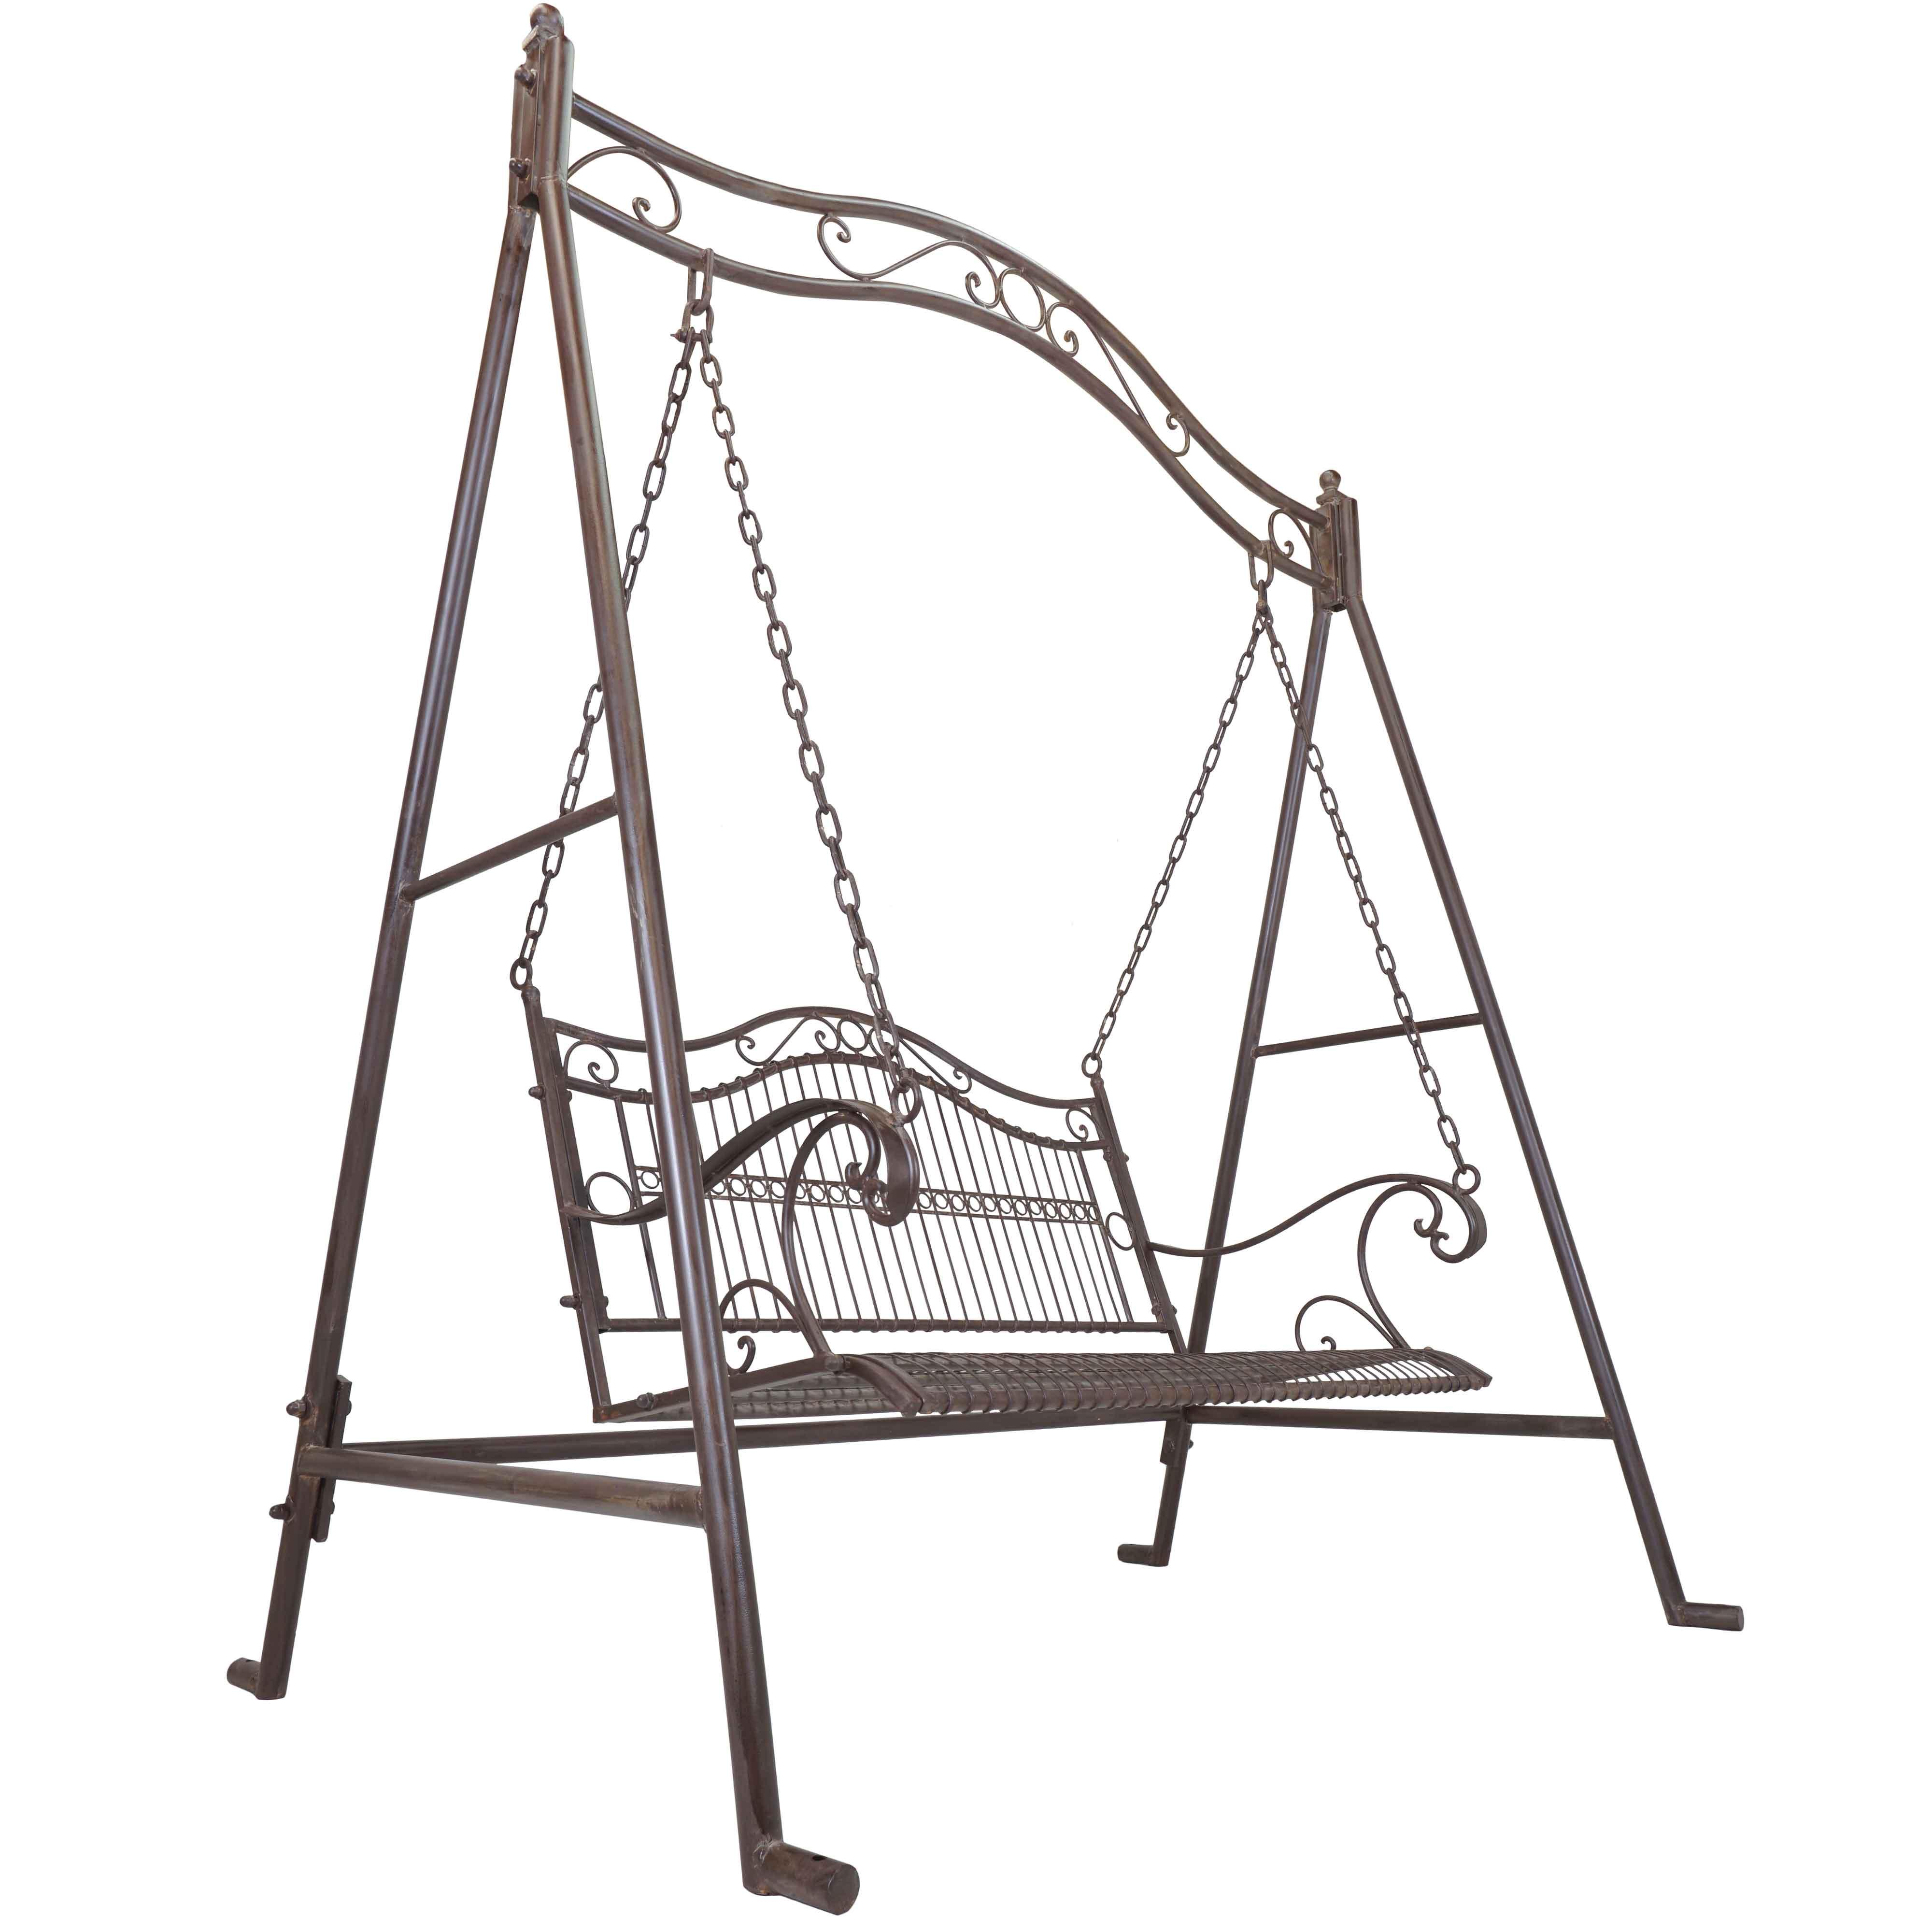 4000x4000 Titan Outdoor Rustic Antique Porch Swing Bench Patio Garden Deck